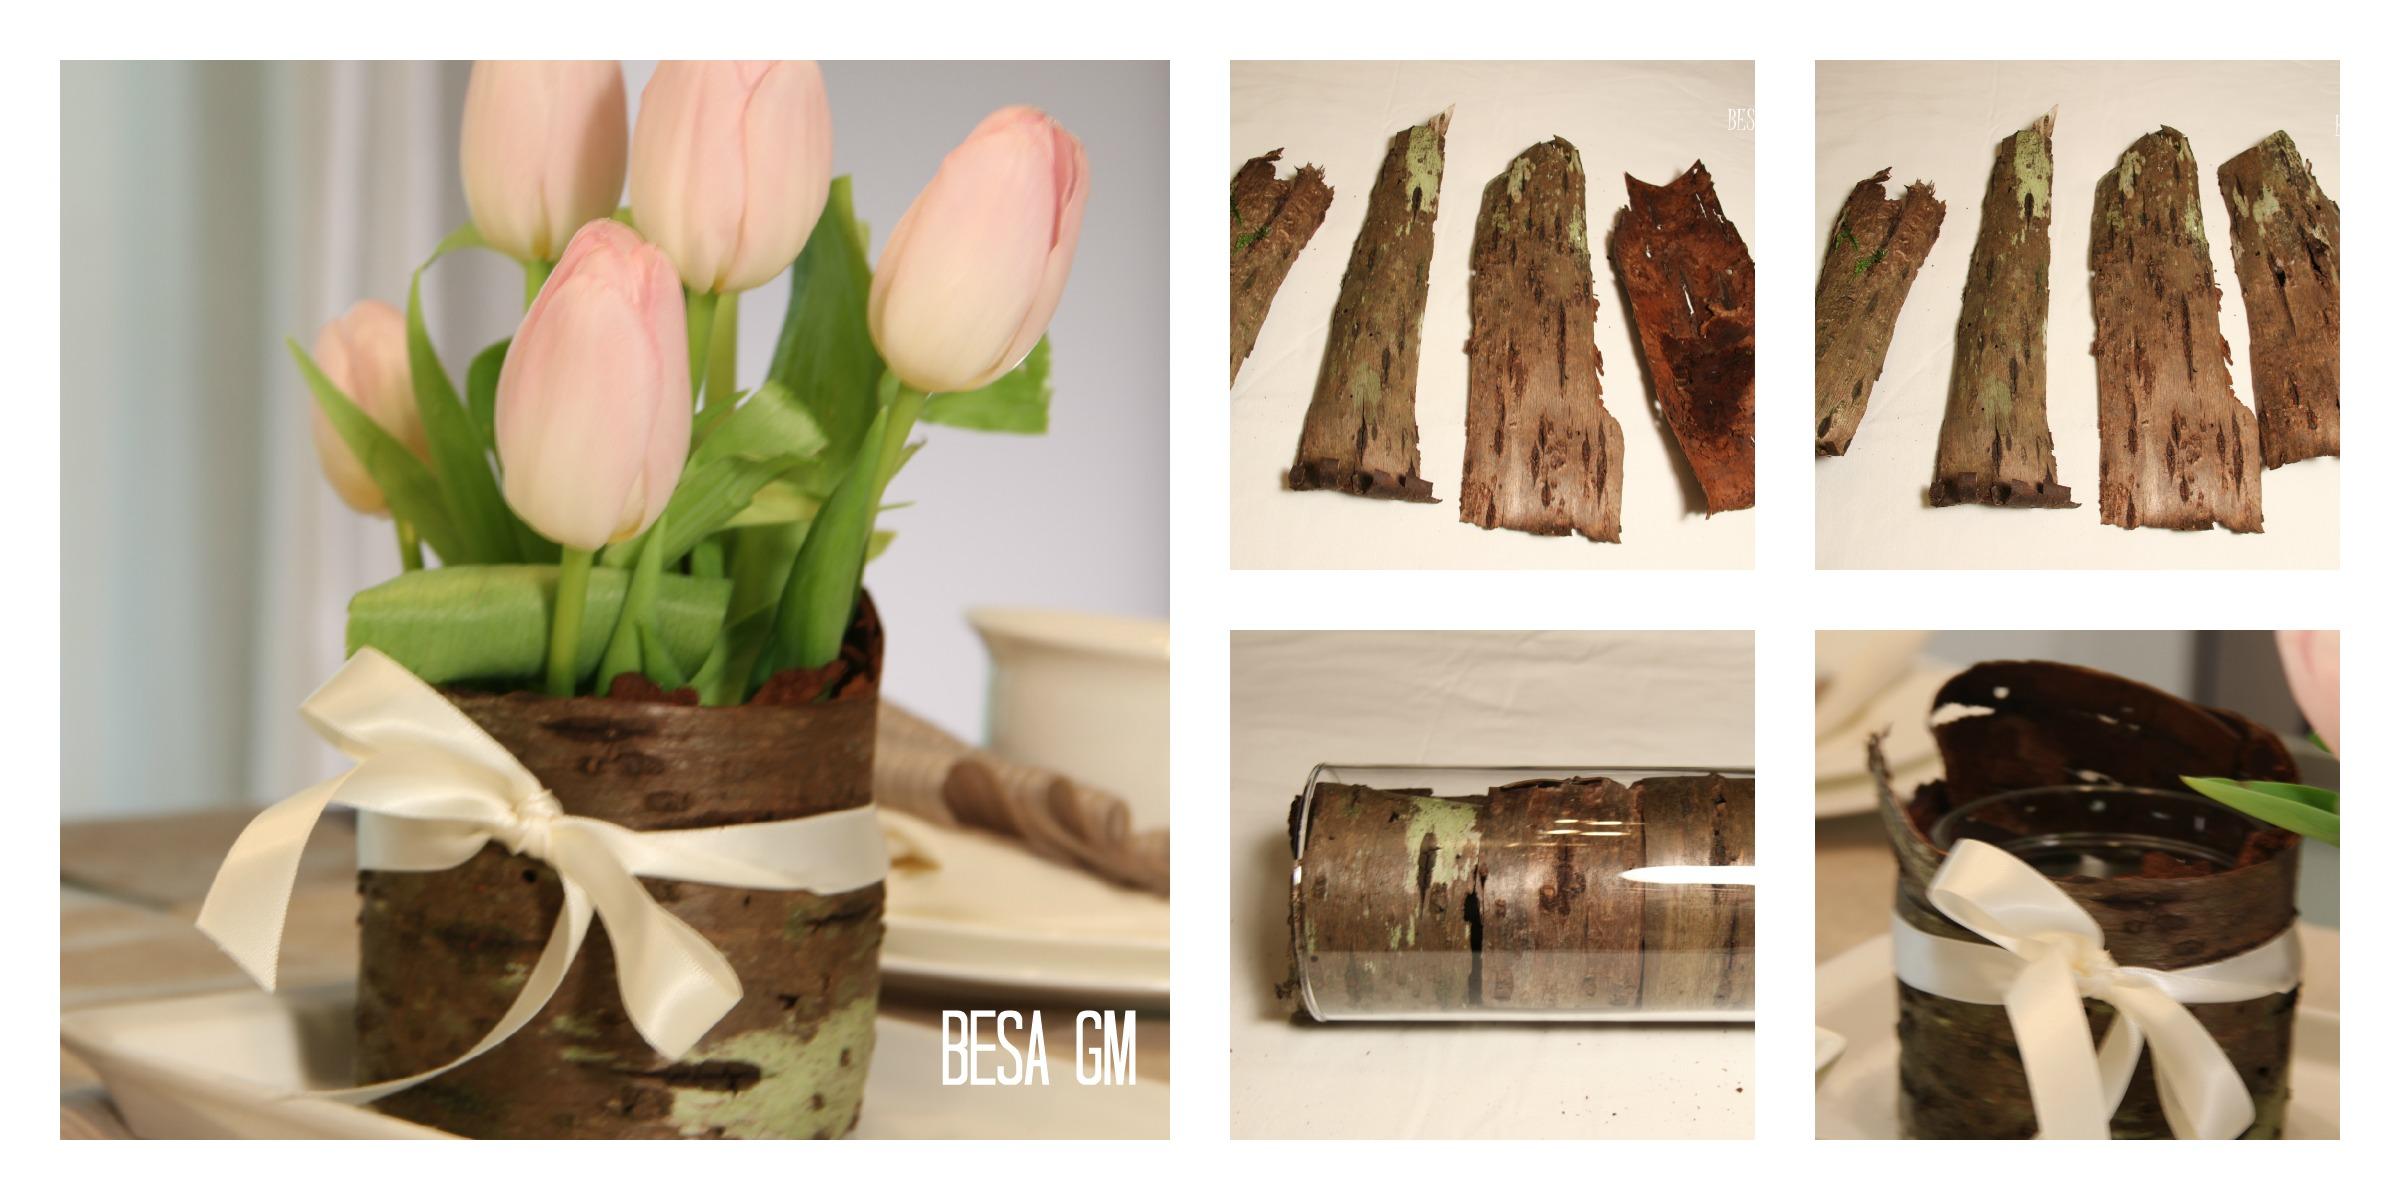 Birch bark vase besa gm wood vase collage reviewsmspy